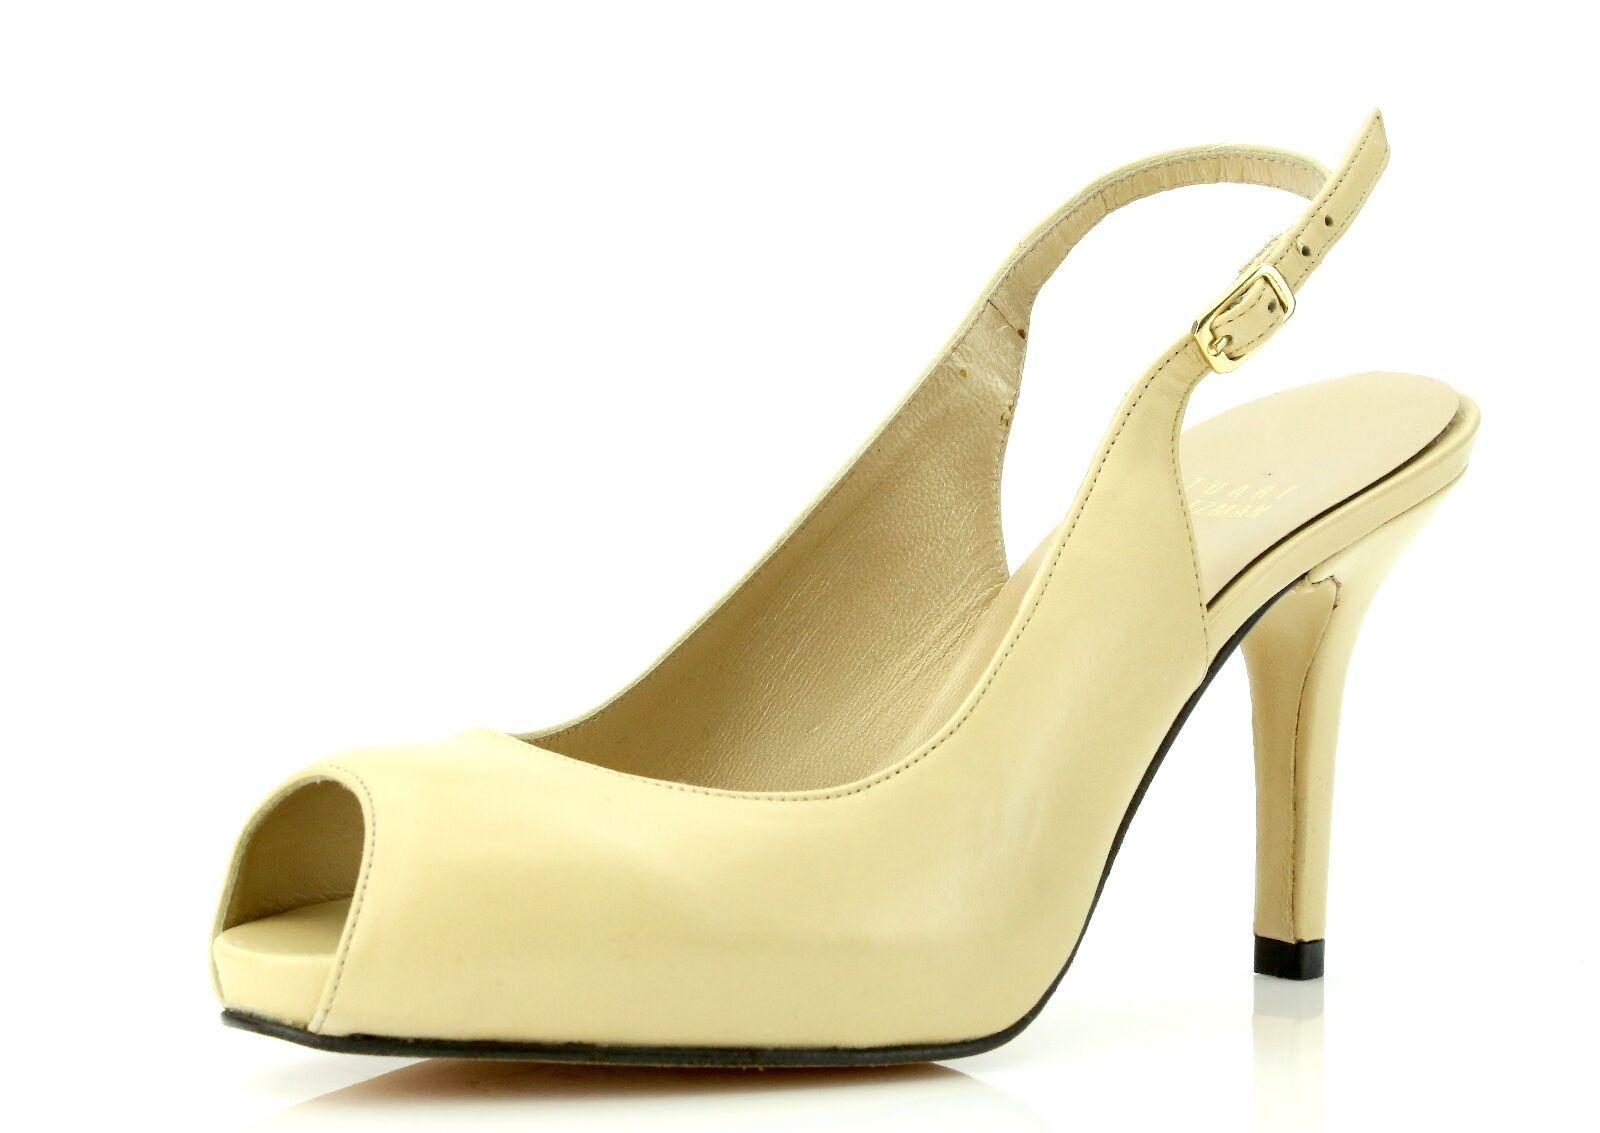 Stuart Weitzman LITELY Beige Leather Peep Toe Pumps 7263 Size 6.5 M NEW